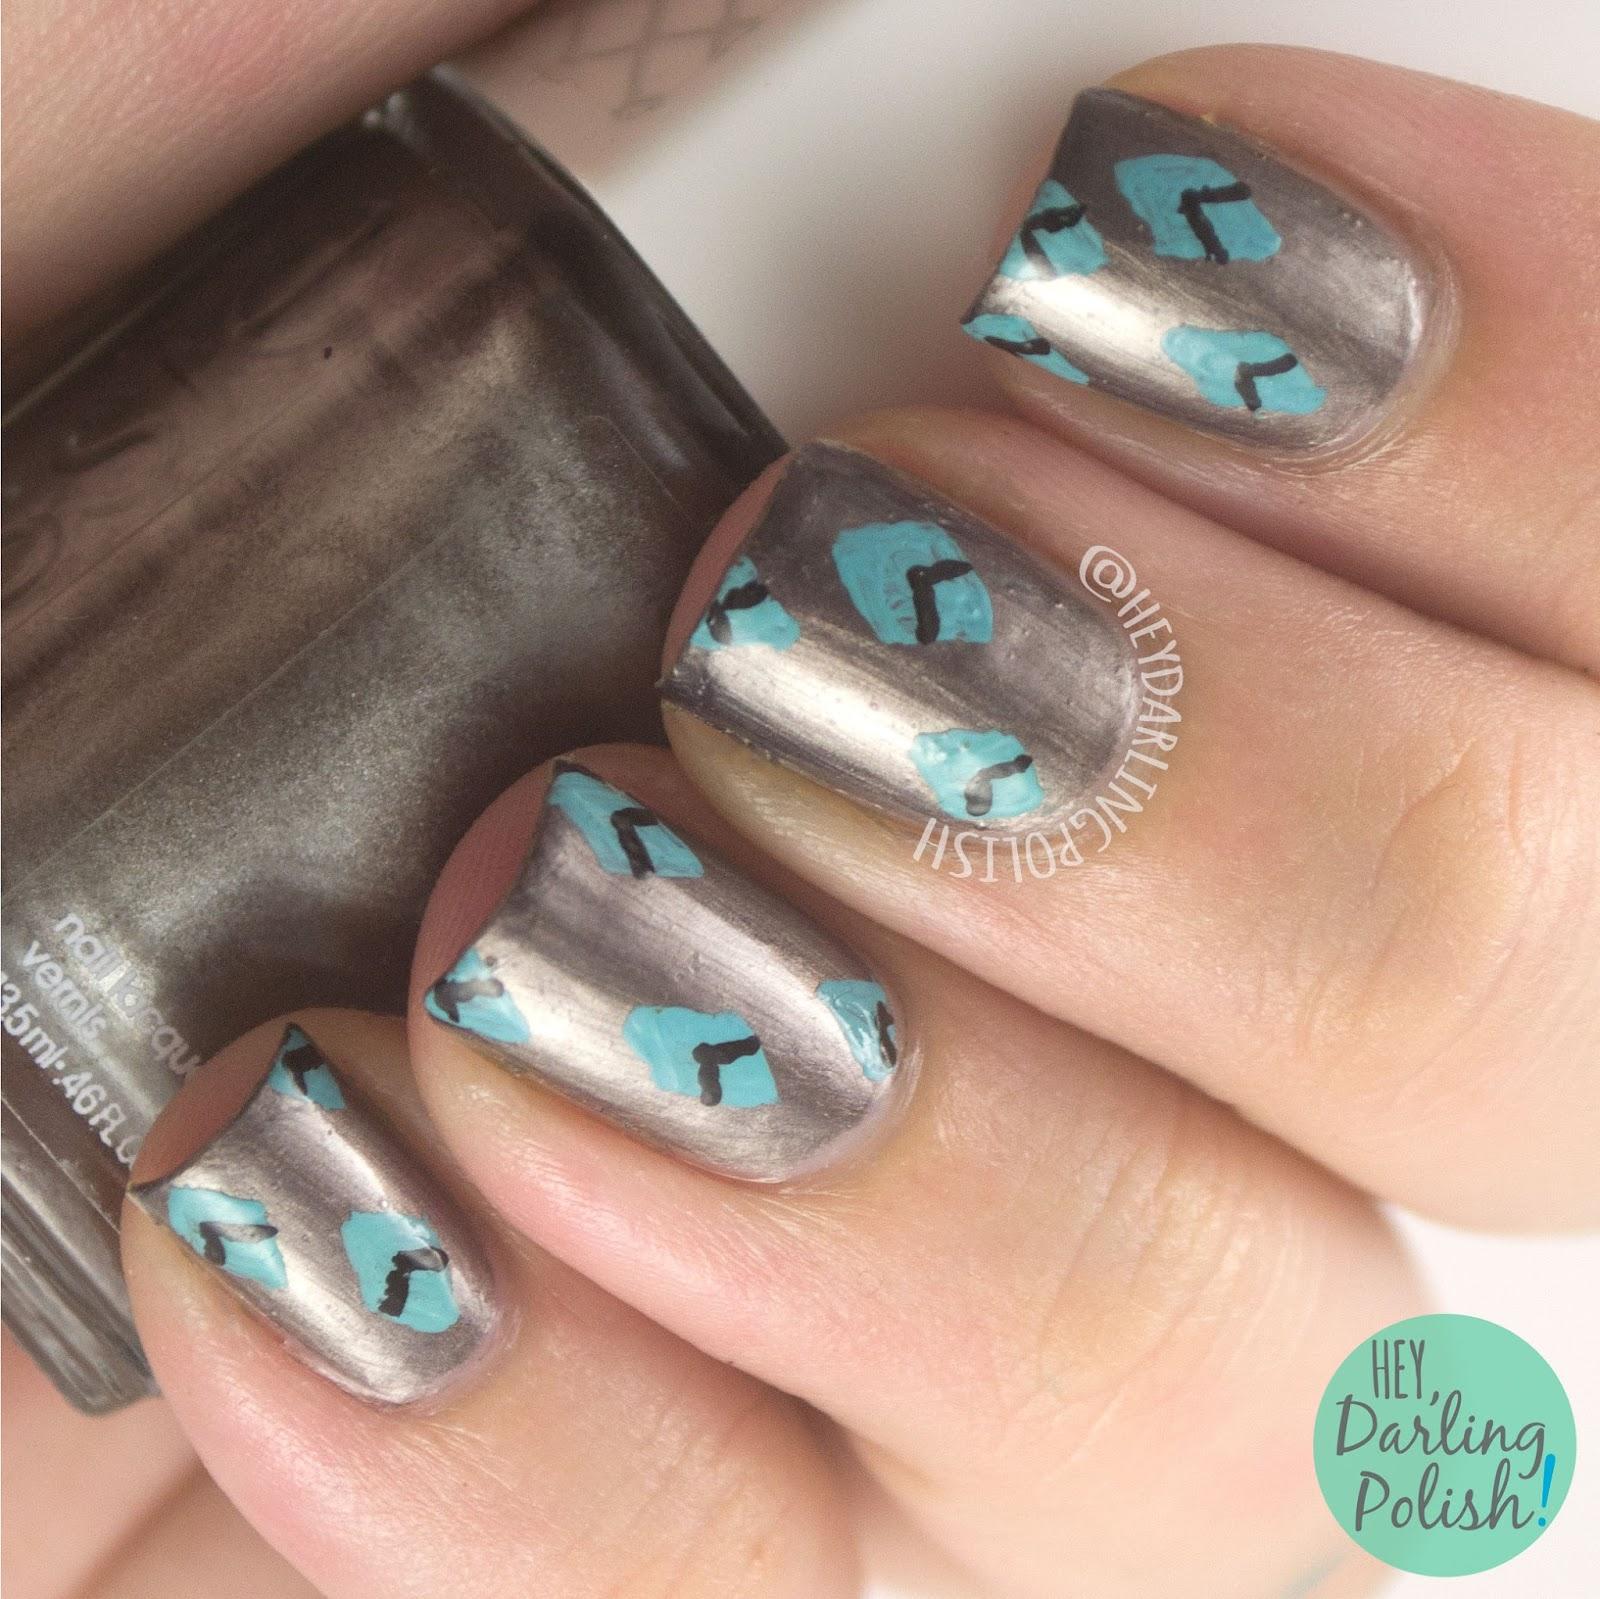 nails, nail art, nail polish, diamonds, pattern, hey darling polish, metallic, 31 day challenge, 31dc2014